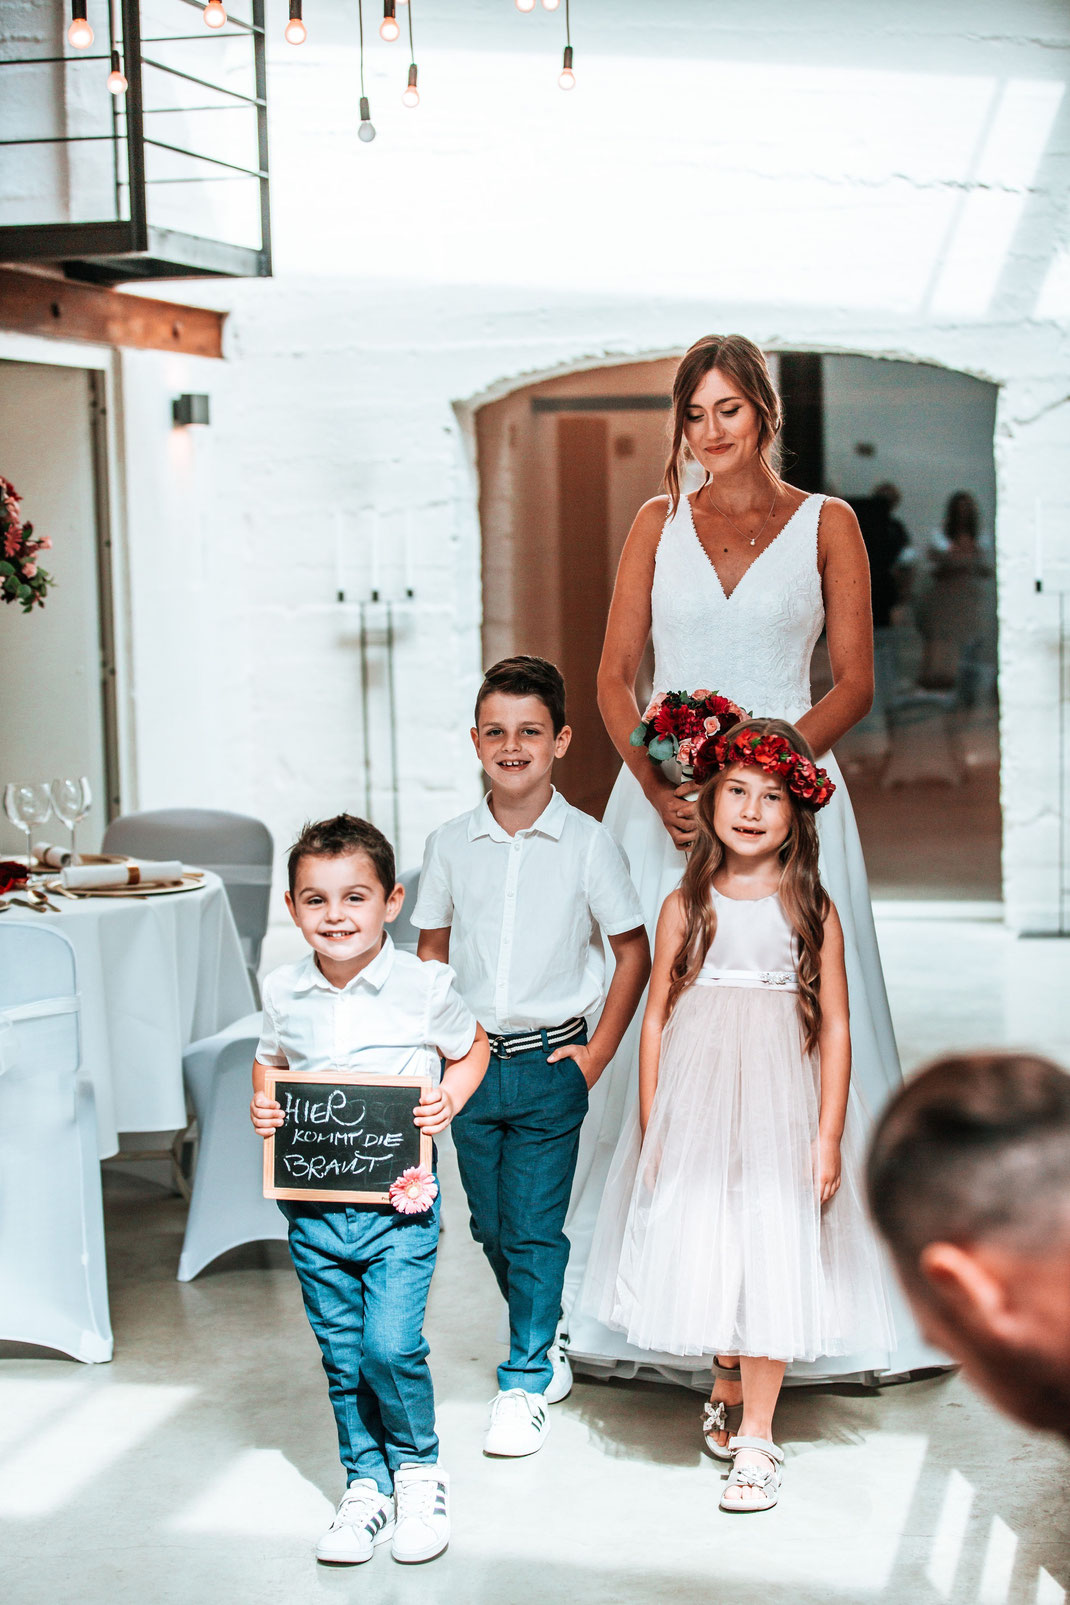 Hier kommt die Braut - Brautmode Isabelle Couture